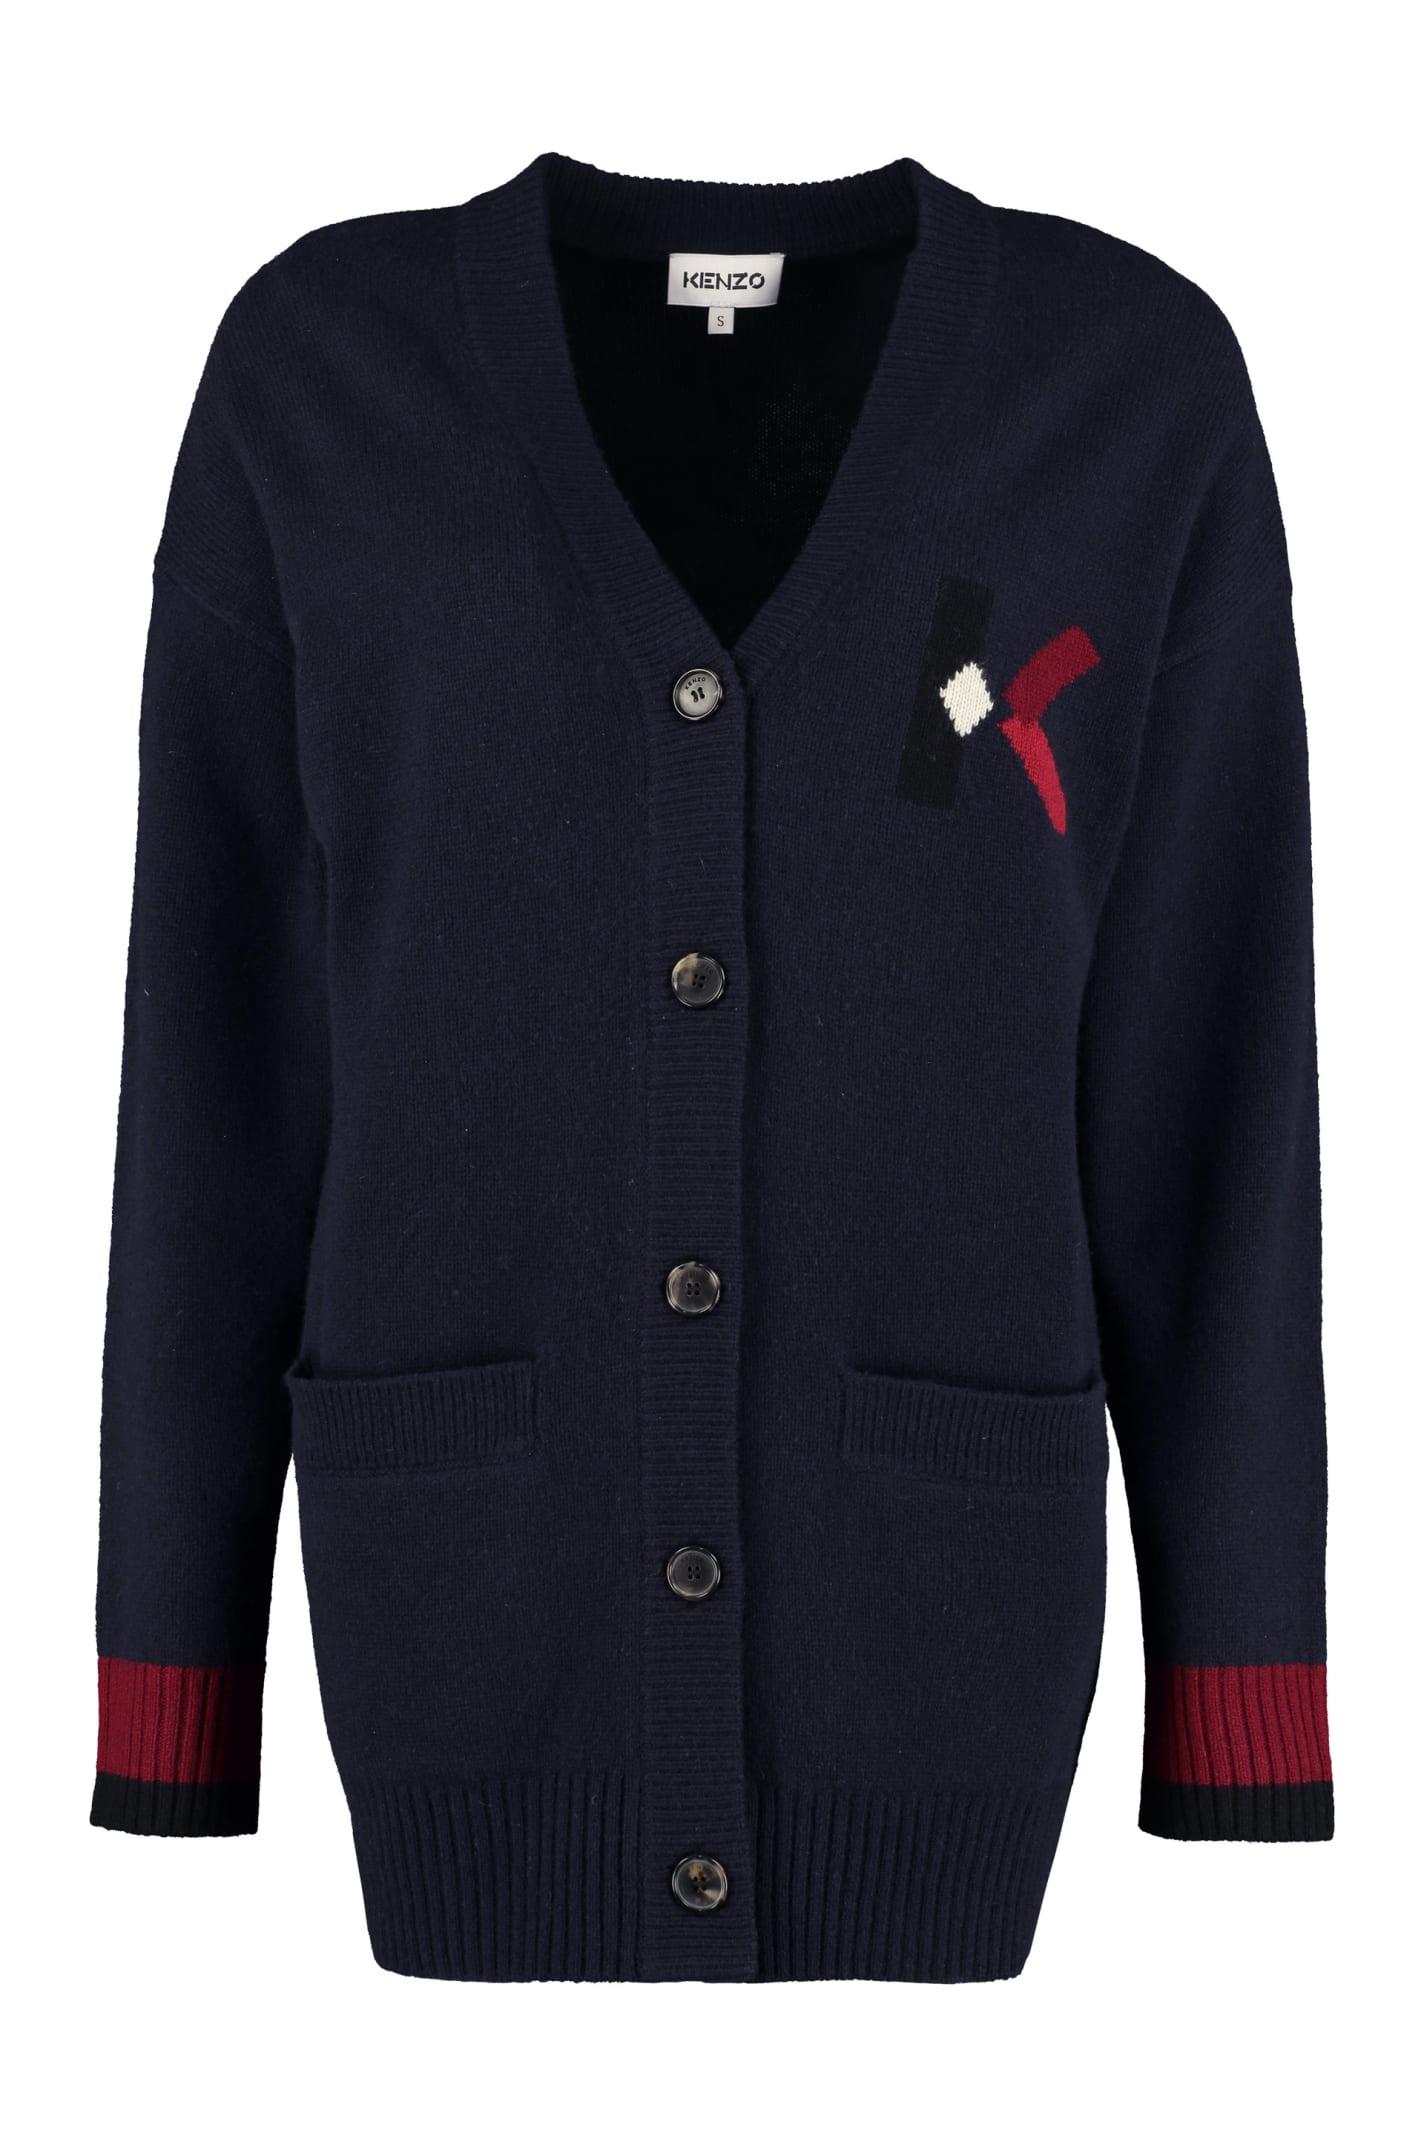 Kenzo Intarsia Wool Blend Cardigan